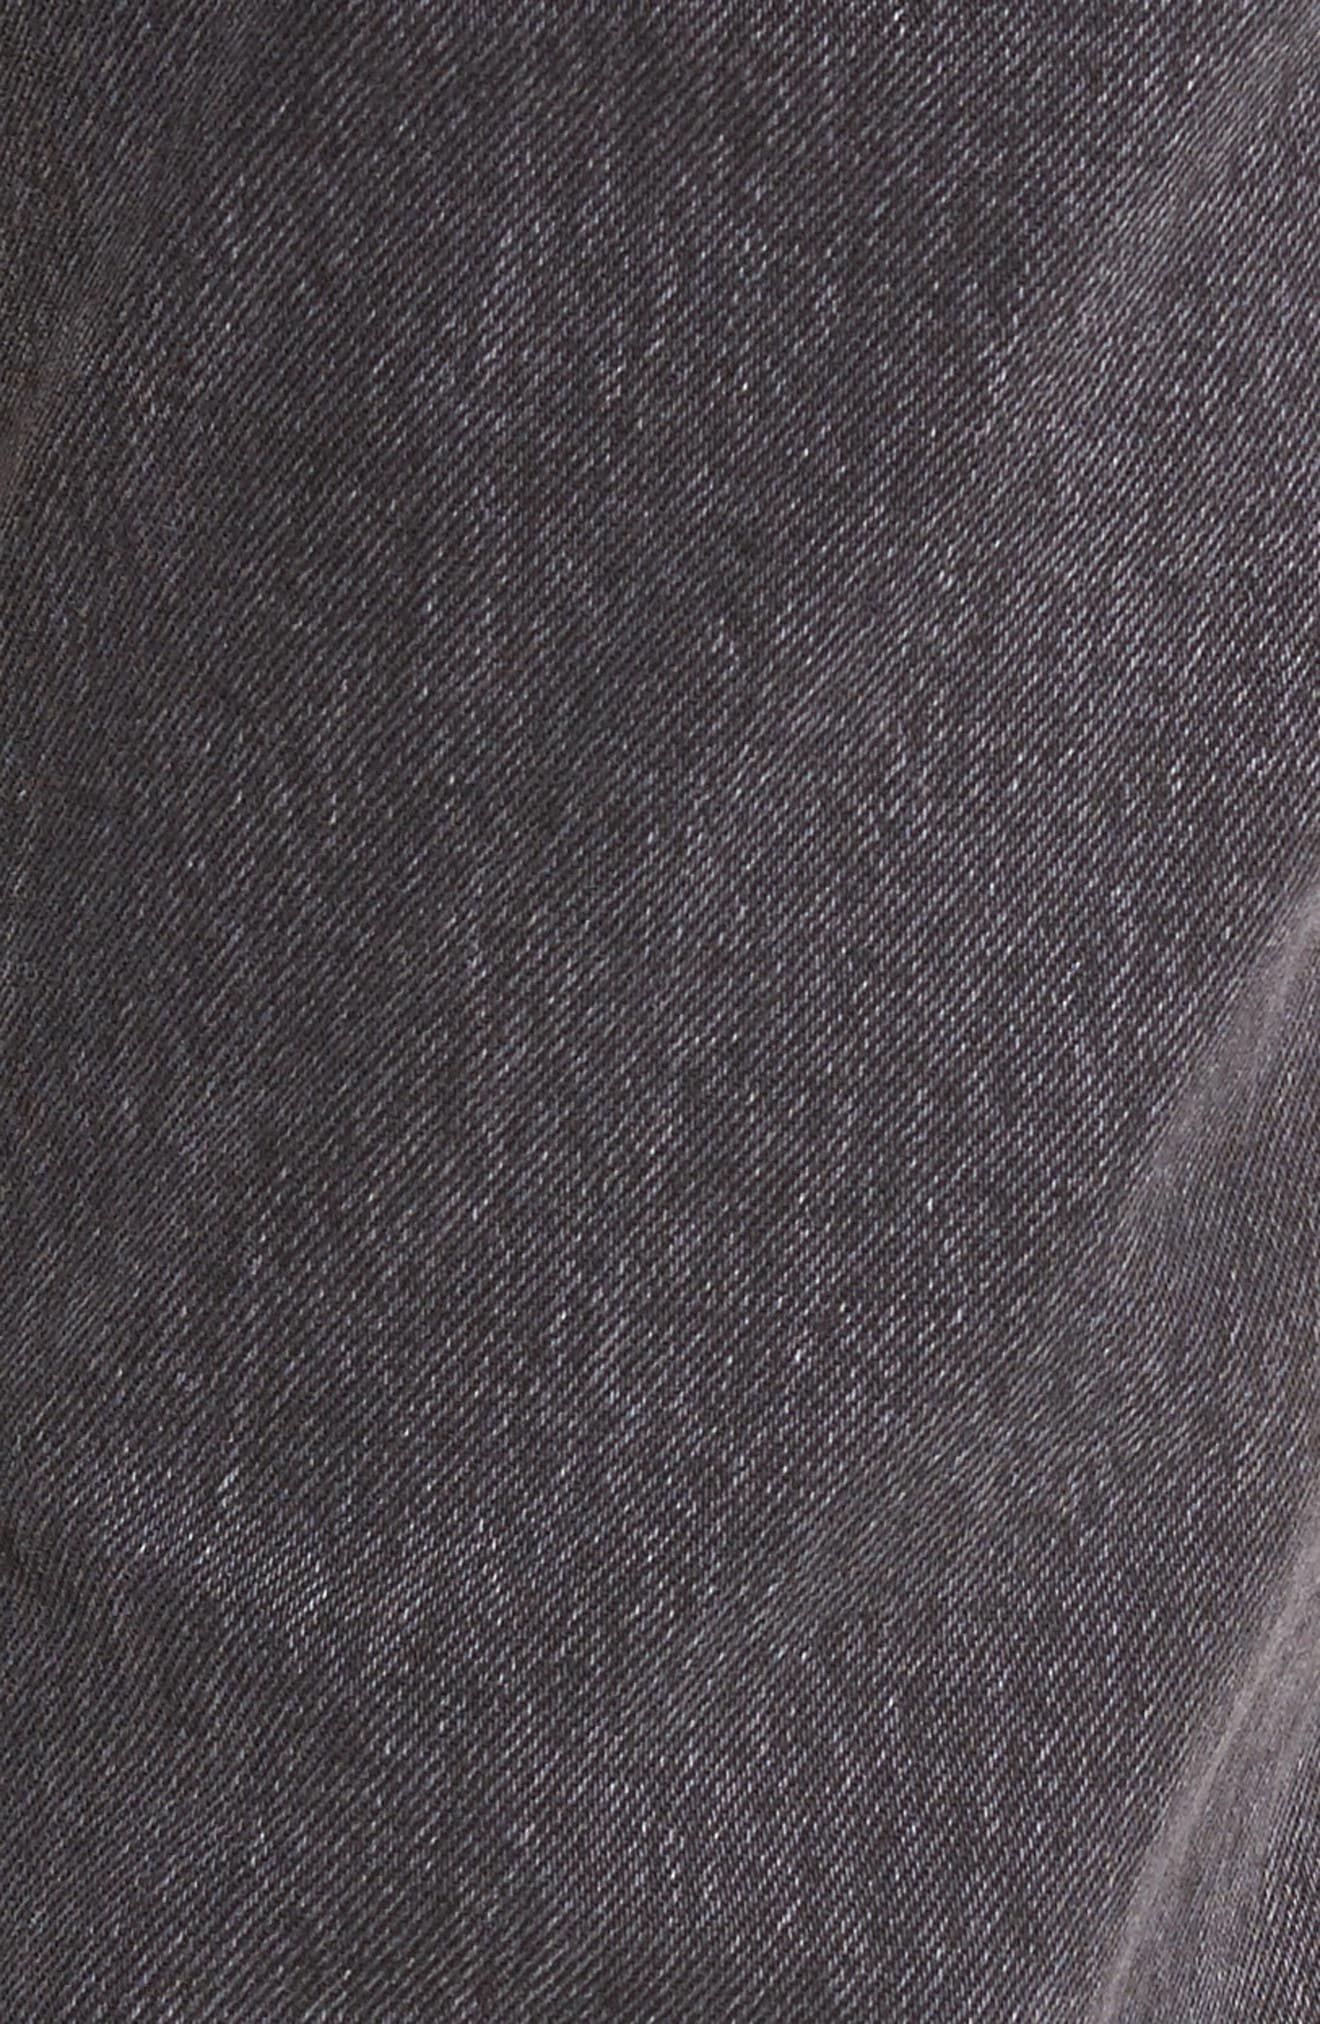 Wedgie High Waist Ankle Straight Leg Jeans,                             Alternate thumbnail 6, color,                             That Girl